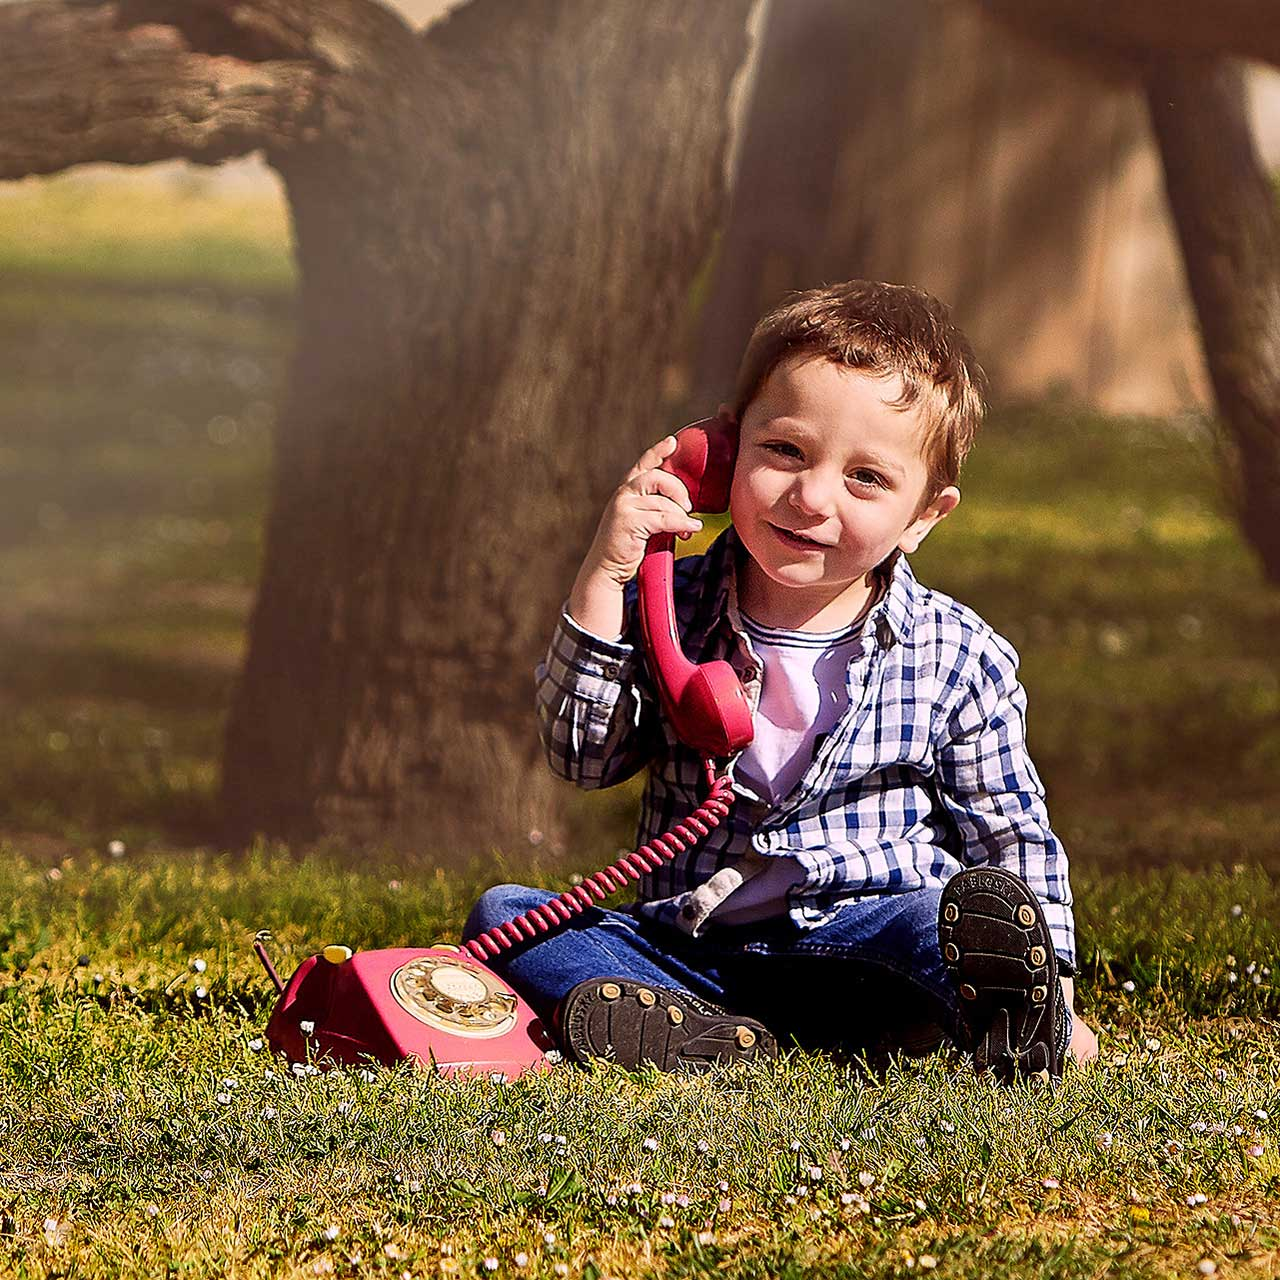 https://www.kidsphotography.es/wp-content/uploads/2021/04/Fotografia-Infantil-Zaragoza-Mateo-0011-©-Kids-Photography.jpg